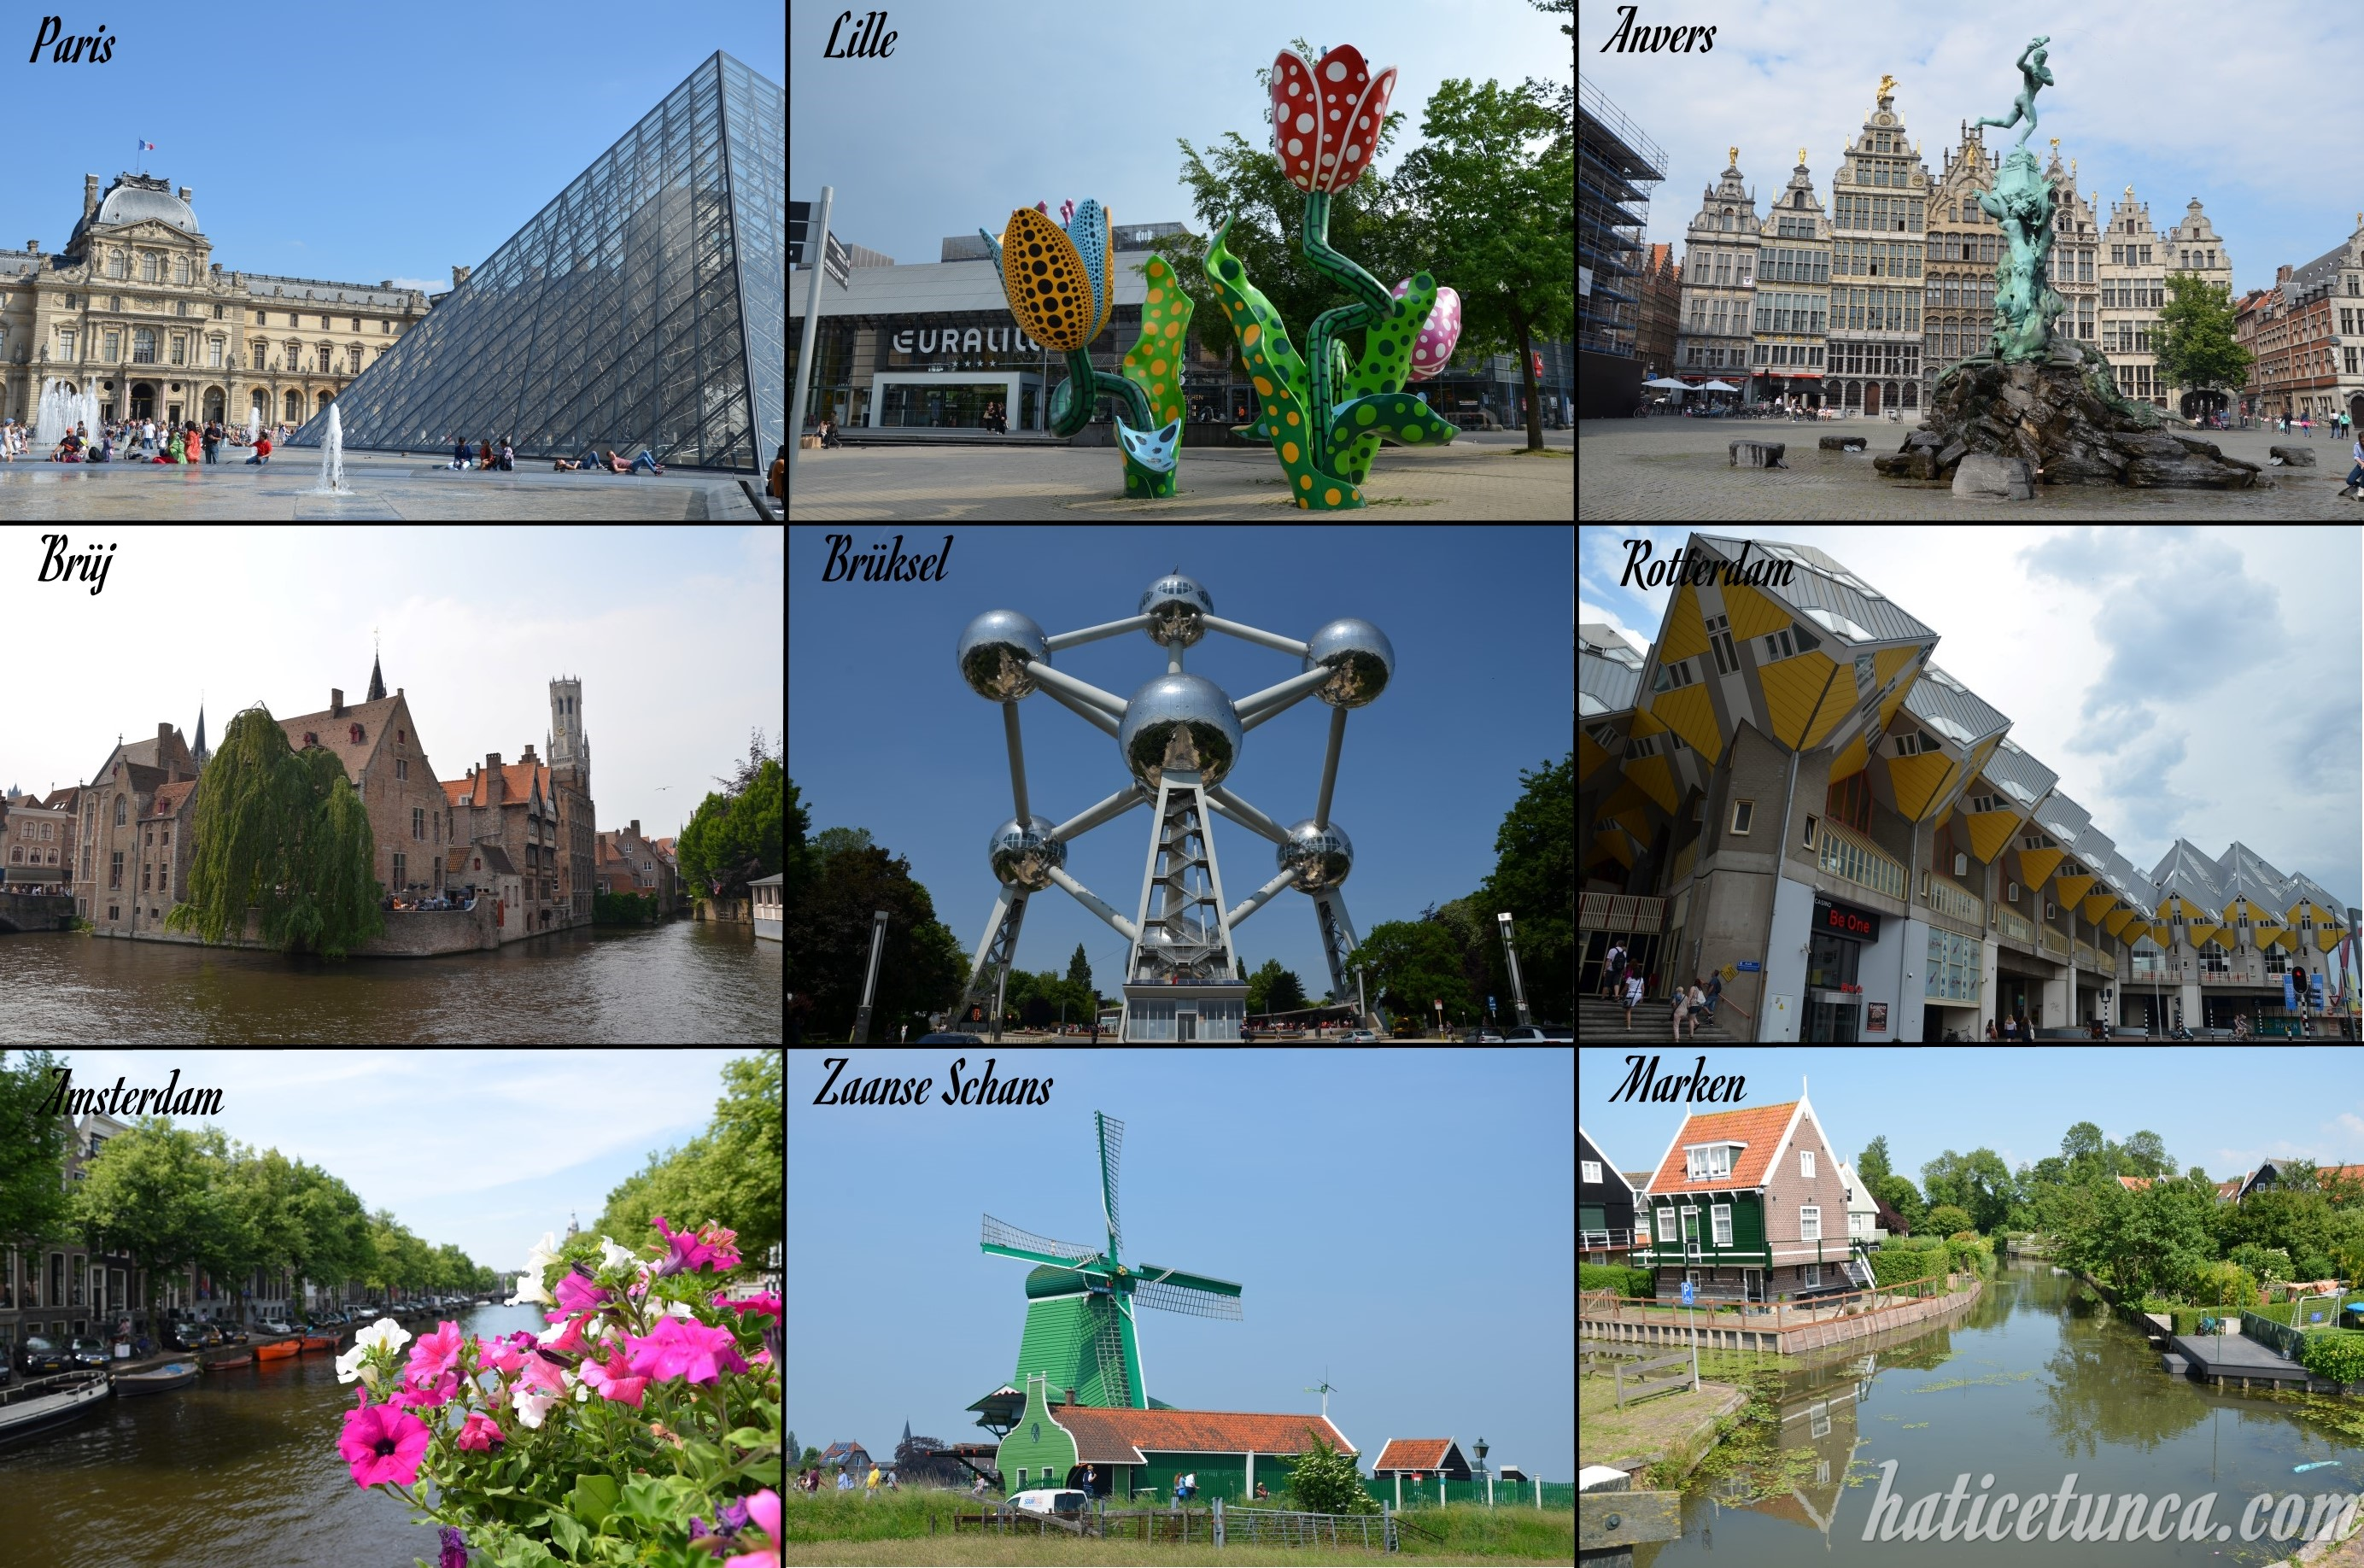 Fransa-Belçika-Hollanda turu